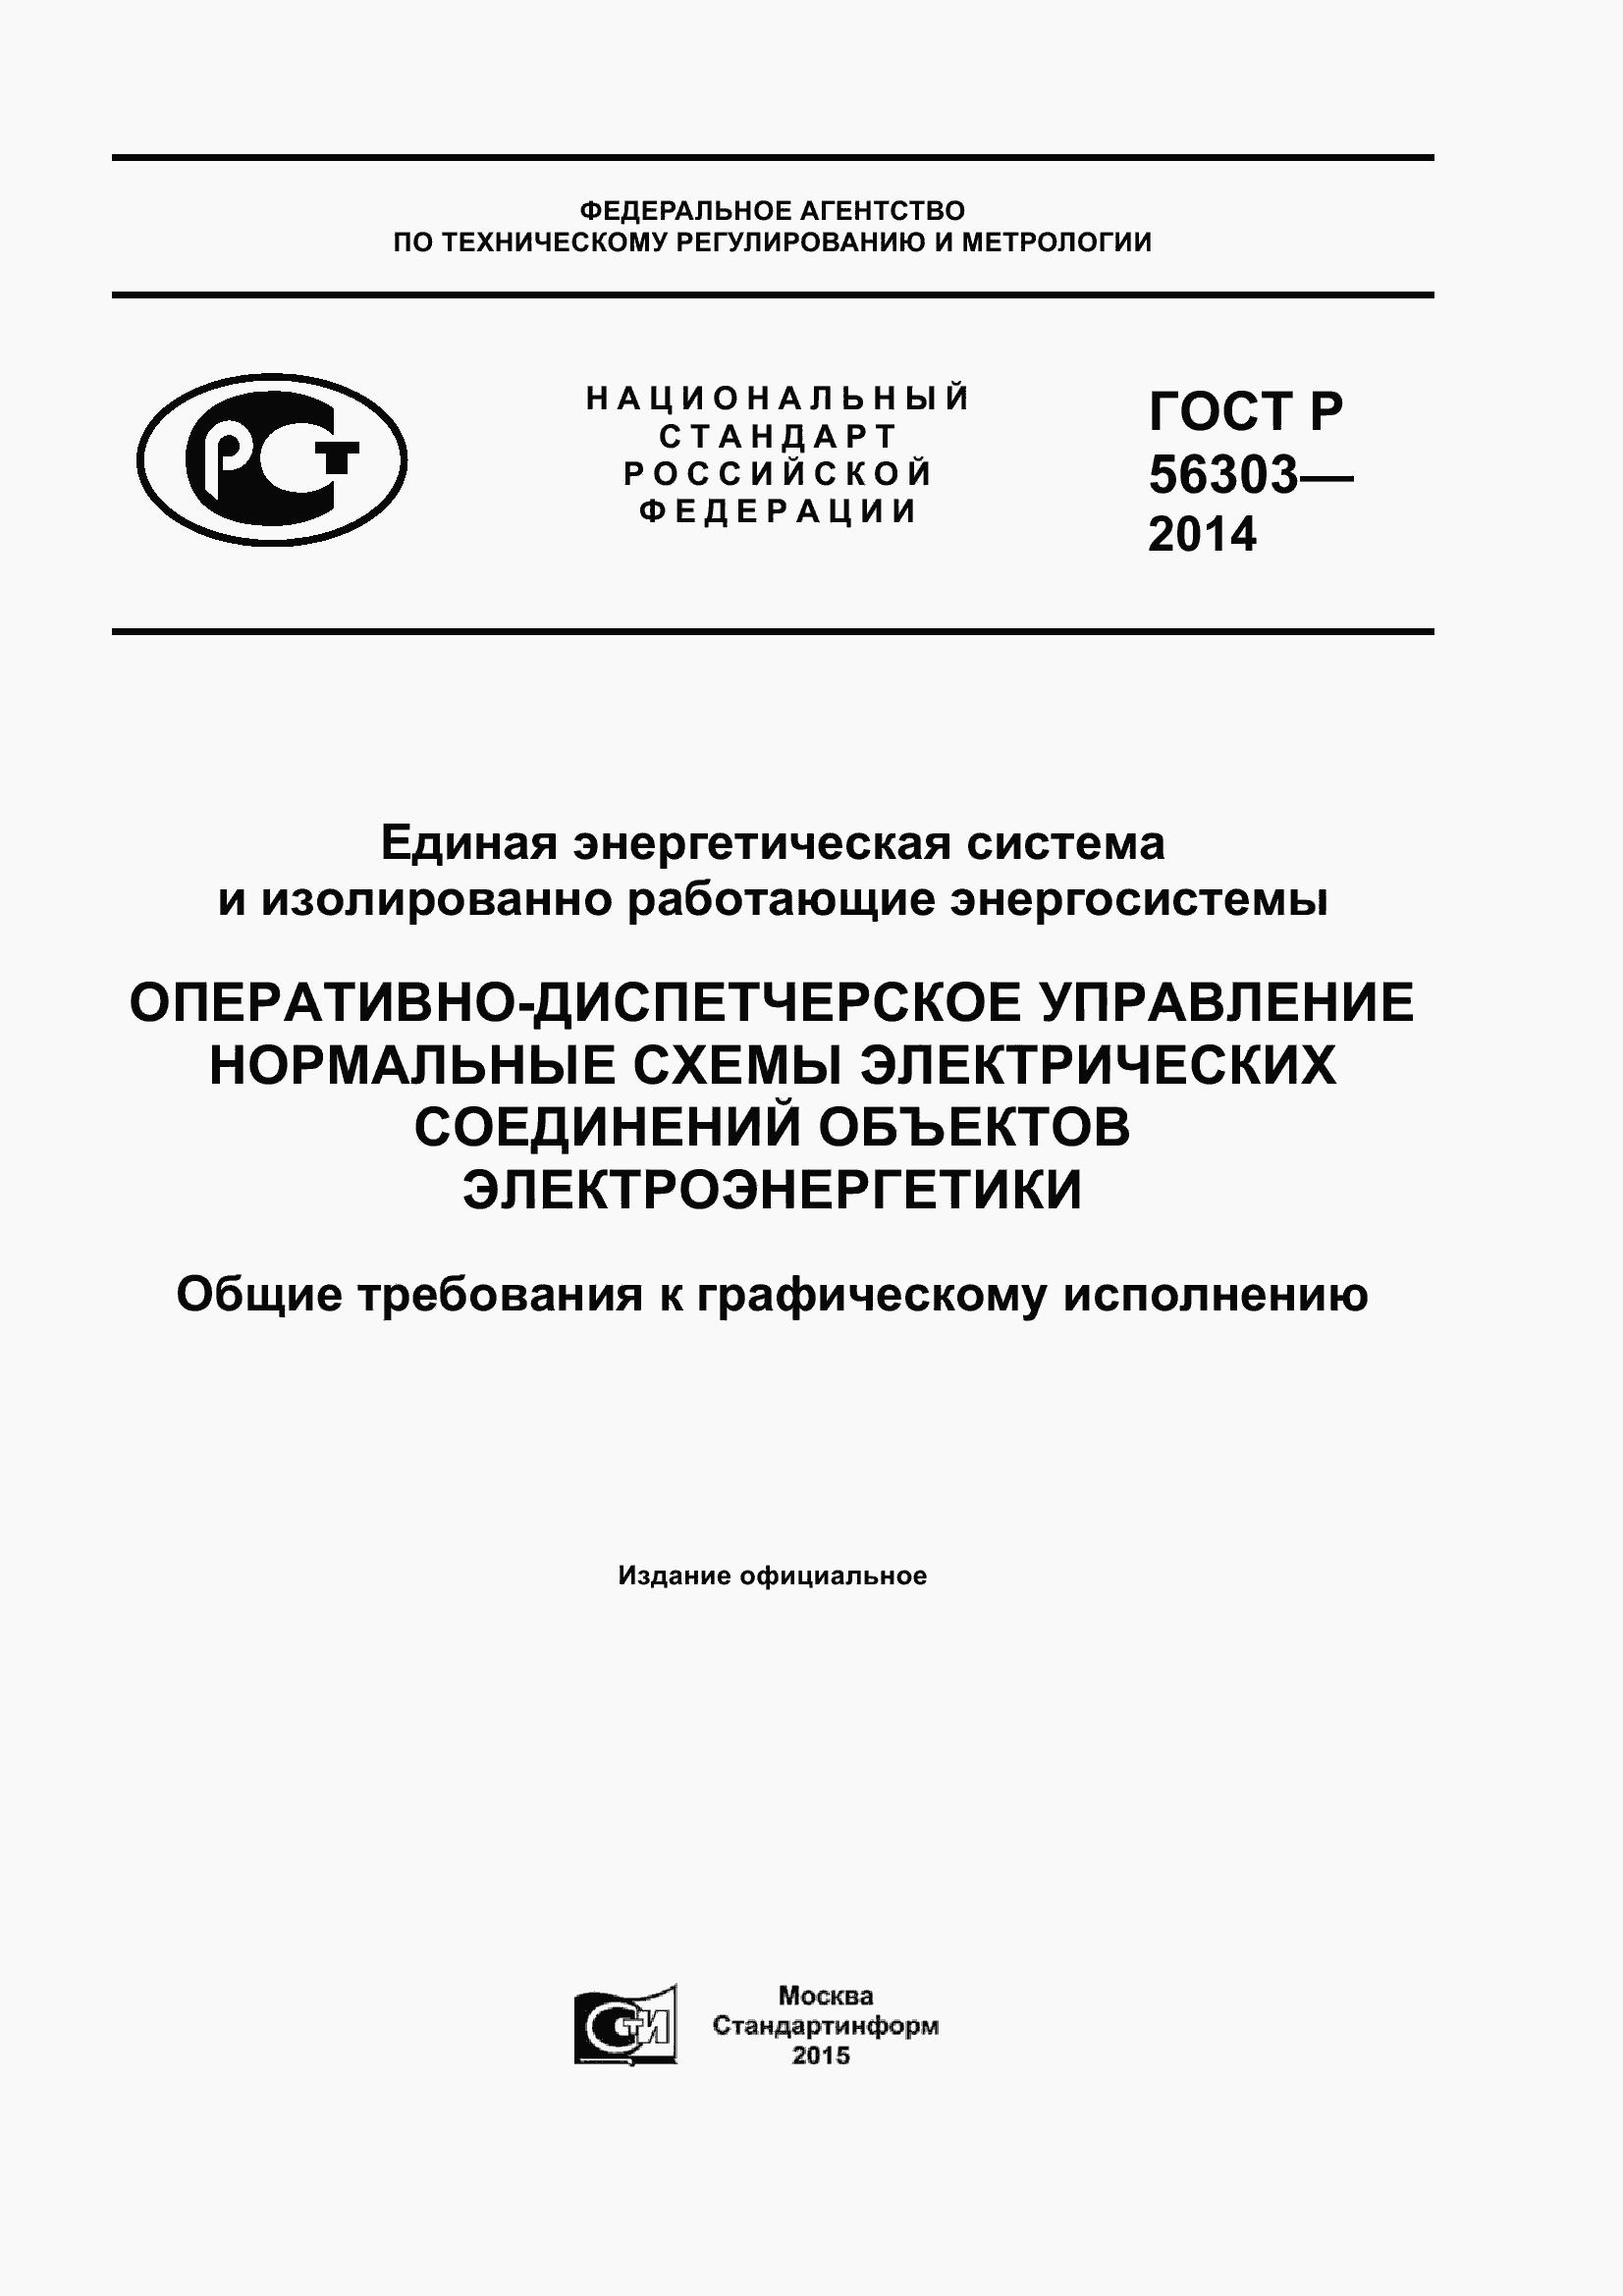 ГОСТ Р 56303-2014. Страница 1